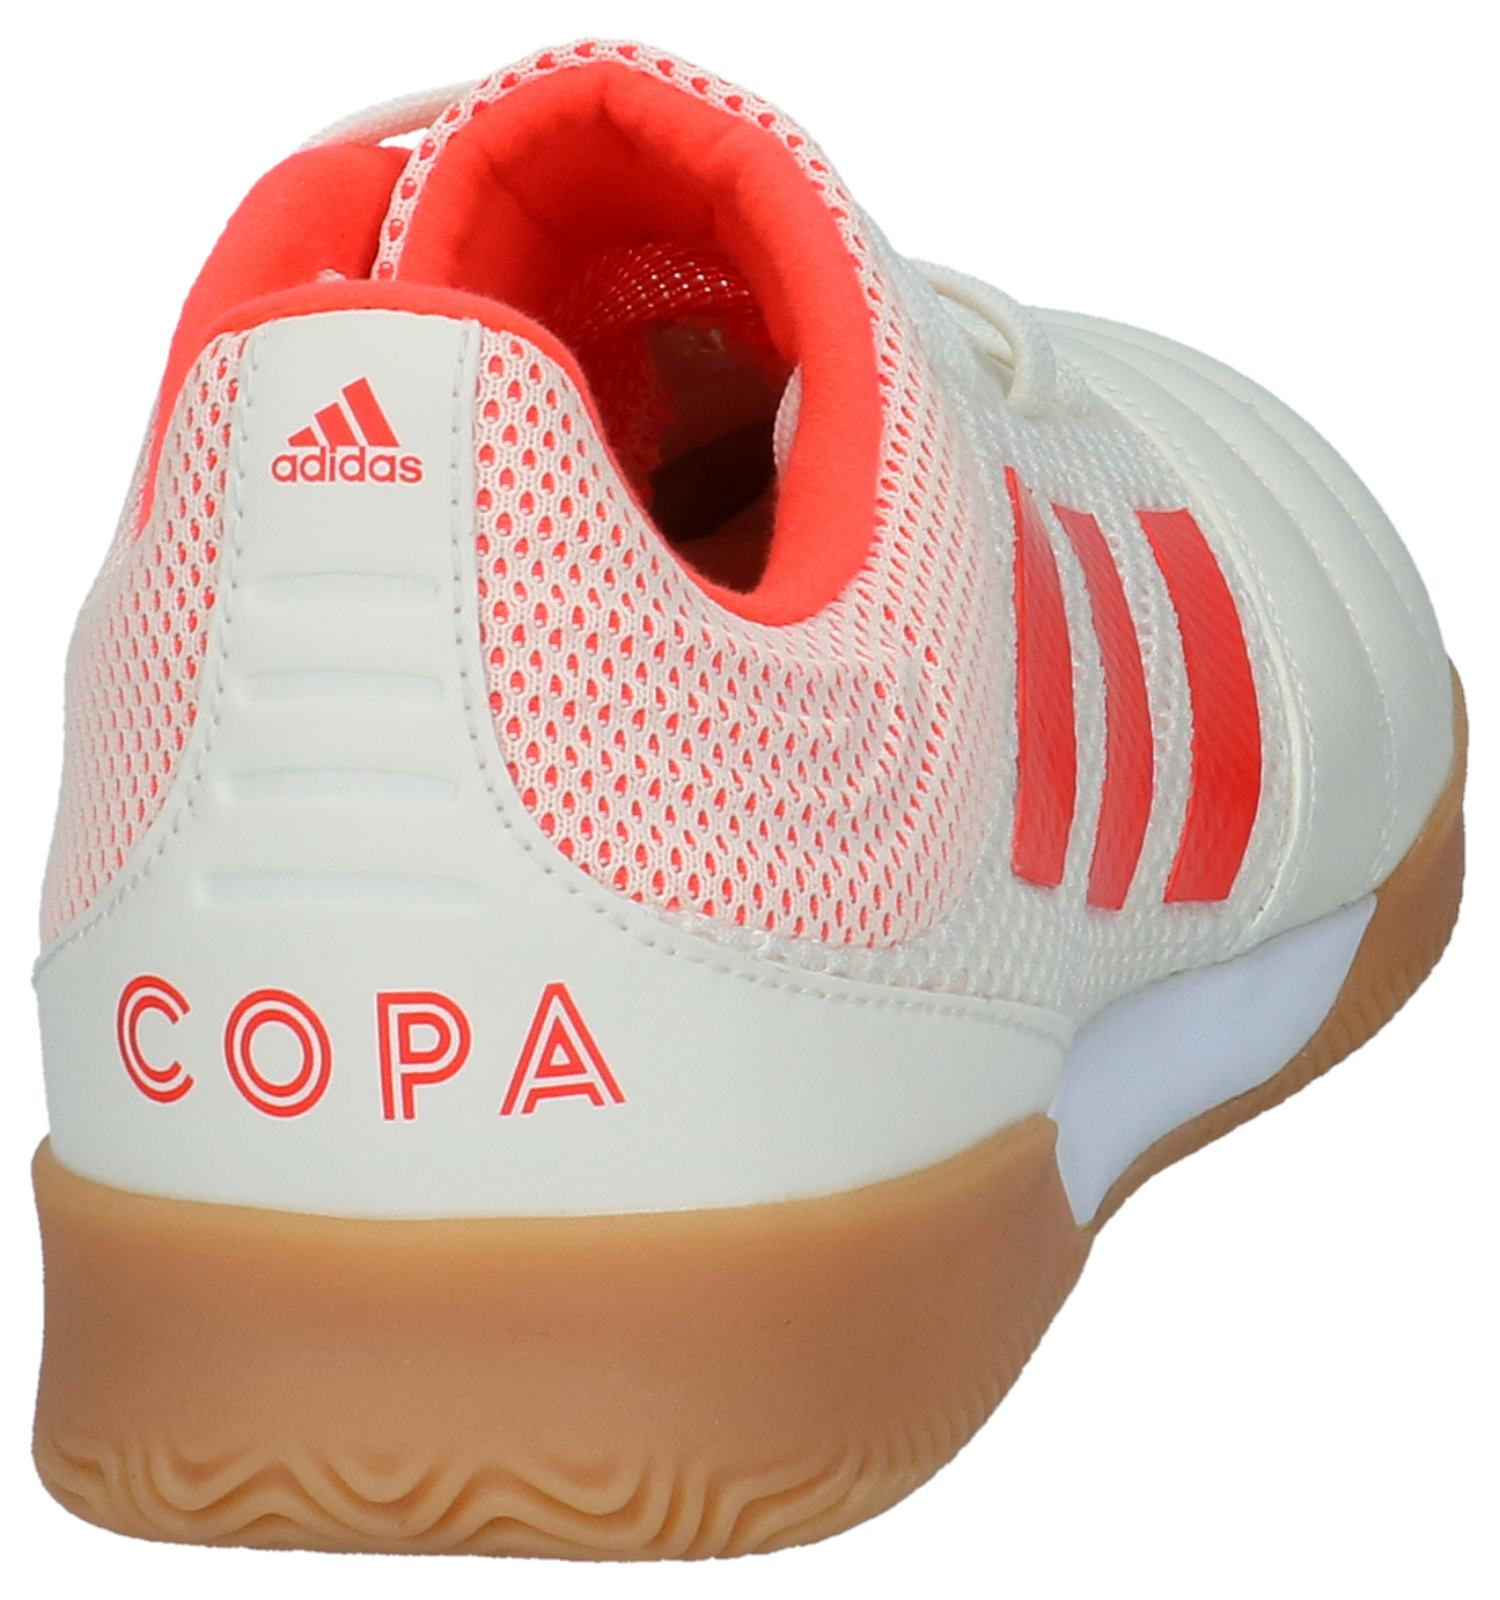 EcruOranje Sportschoenen adidas Copa 19.3 IN Sala | TORFS